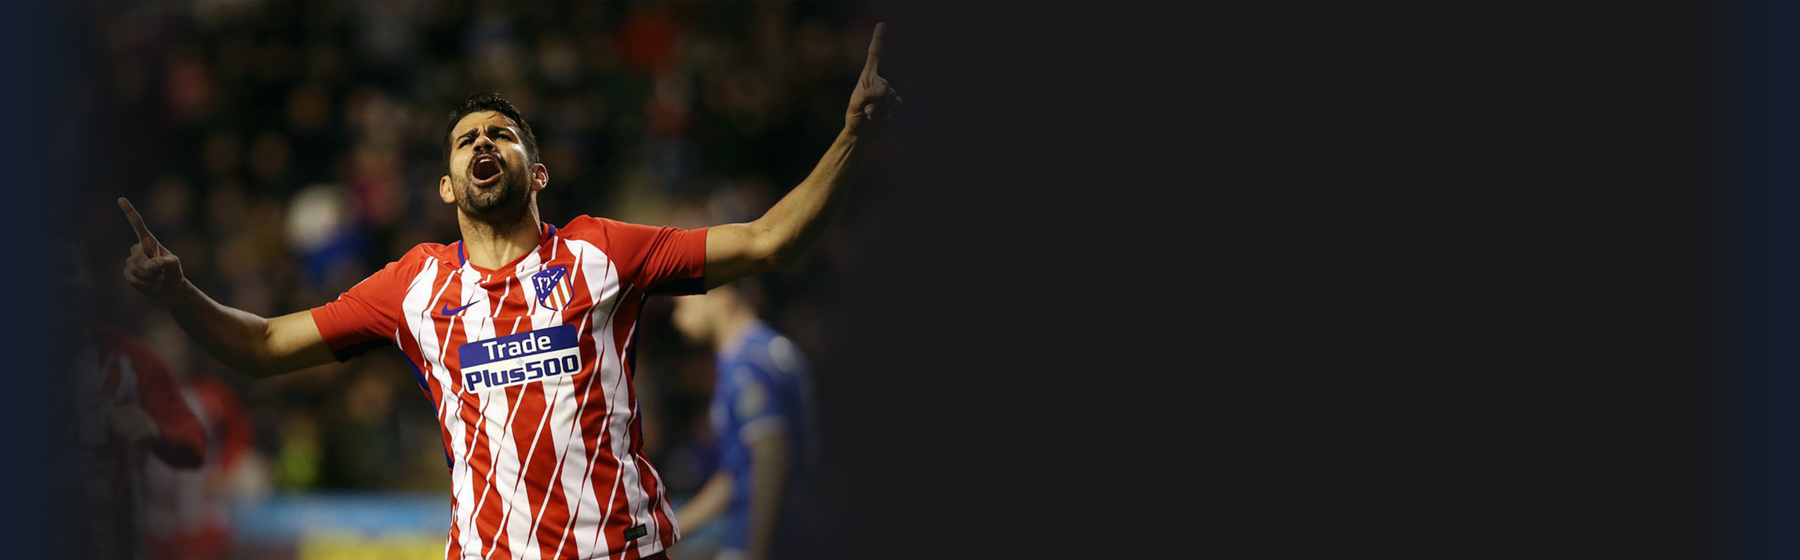 Jersey Atletico Madrid Diego Costa image header